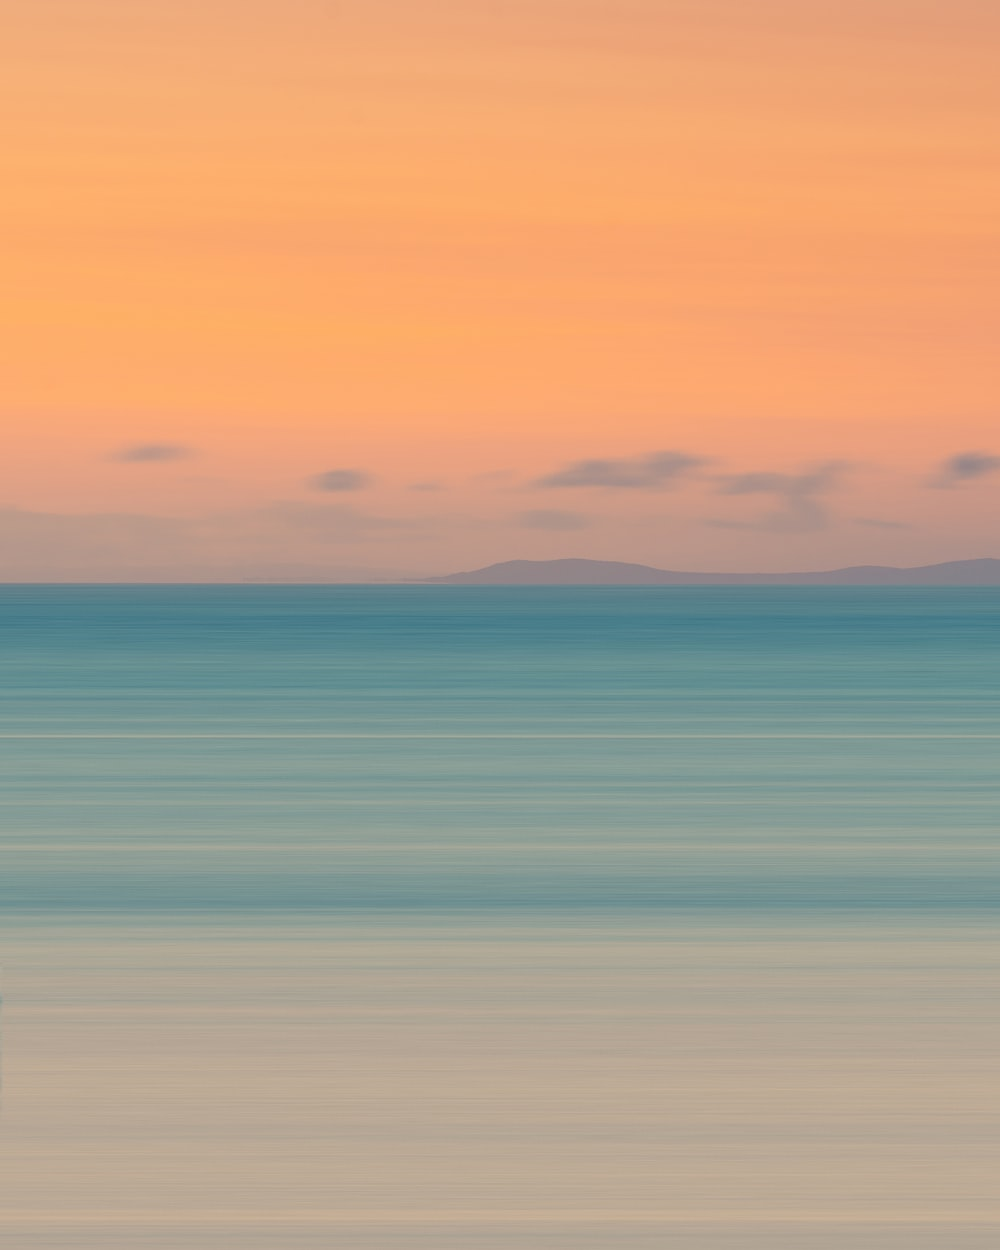 blue and orange sky over the sea